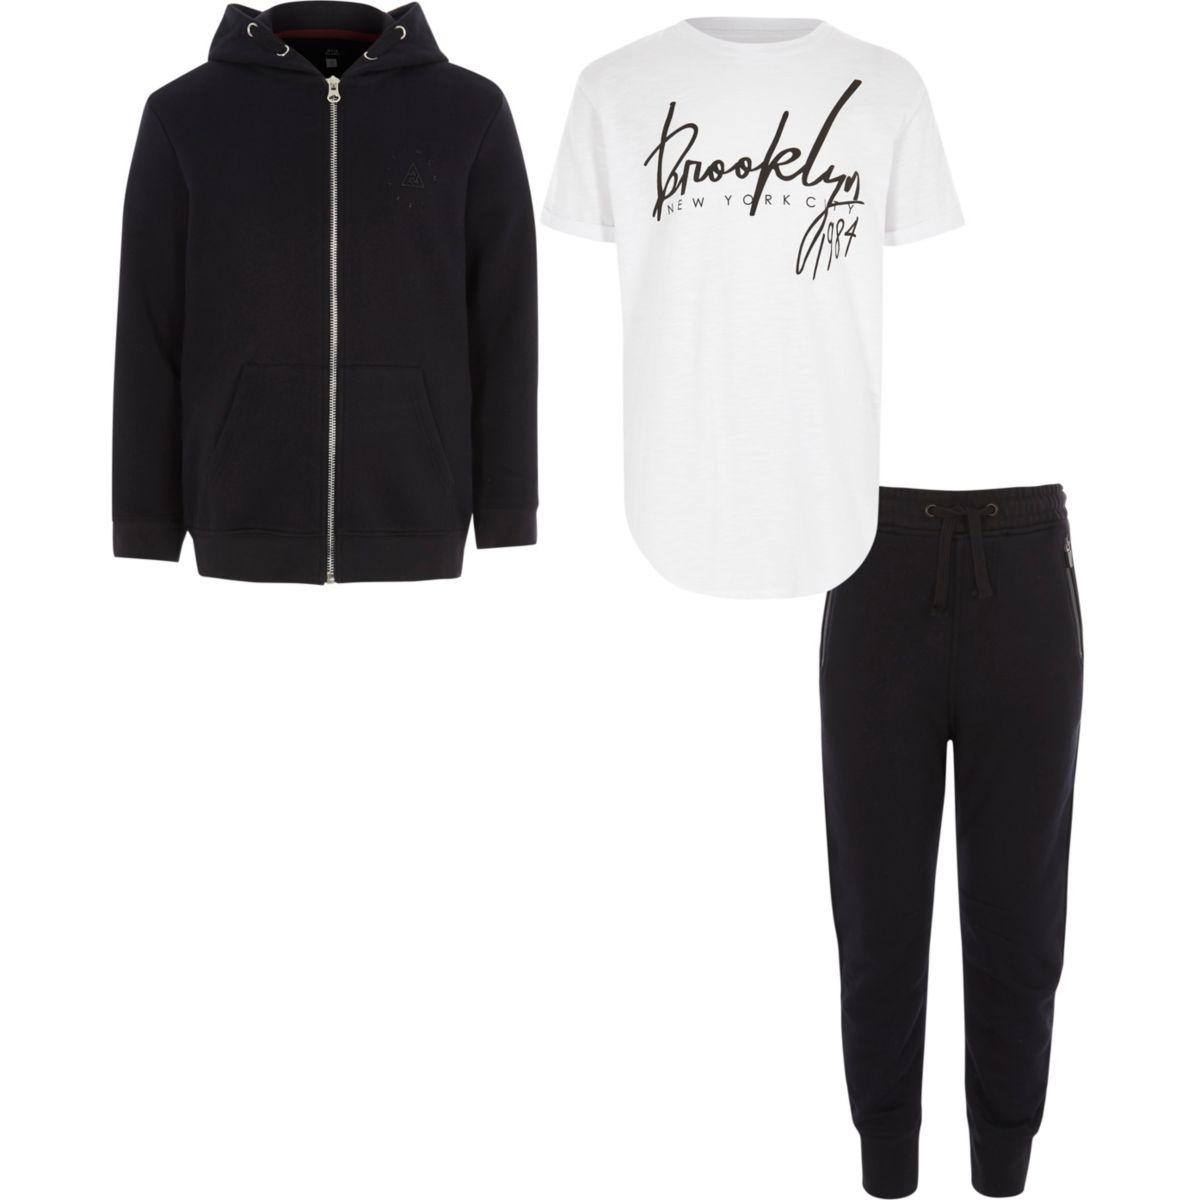 Boys navy 'Brooklyn' T-shirt hoodie outfit